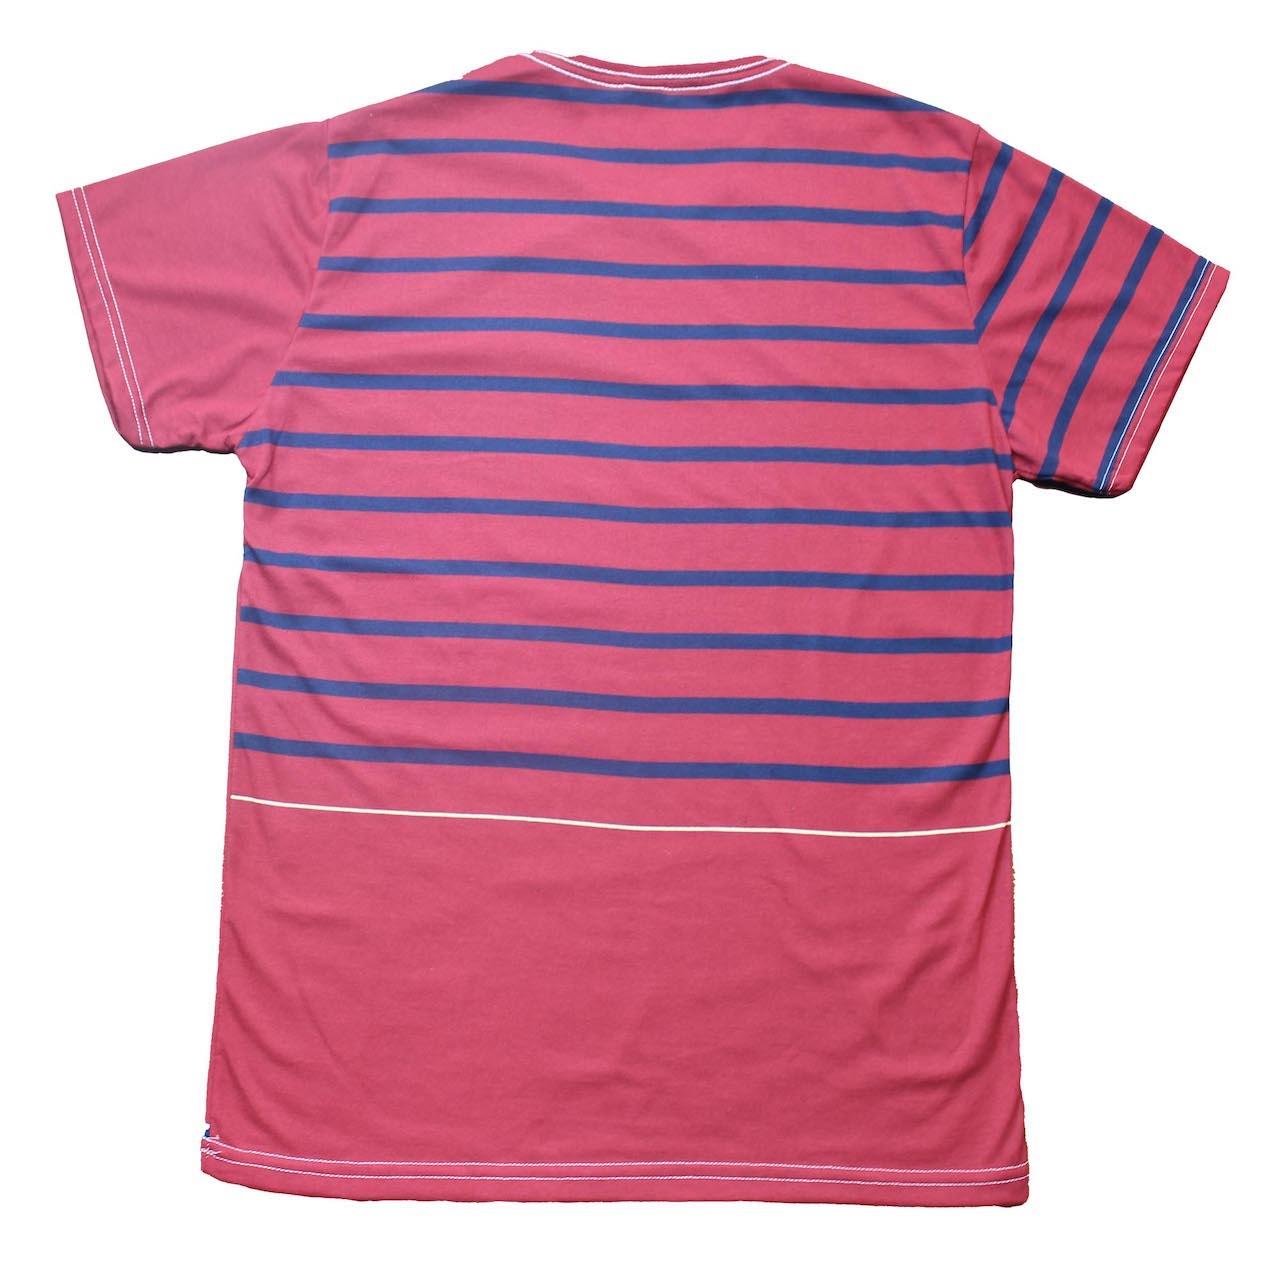 Camiseta Gola V Estampada Masculina - Tamanho G